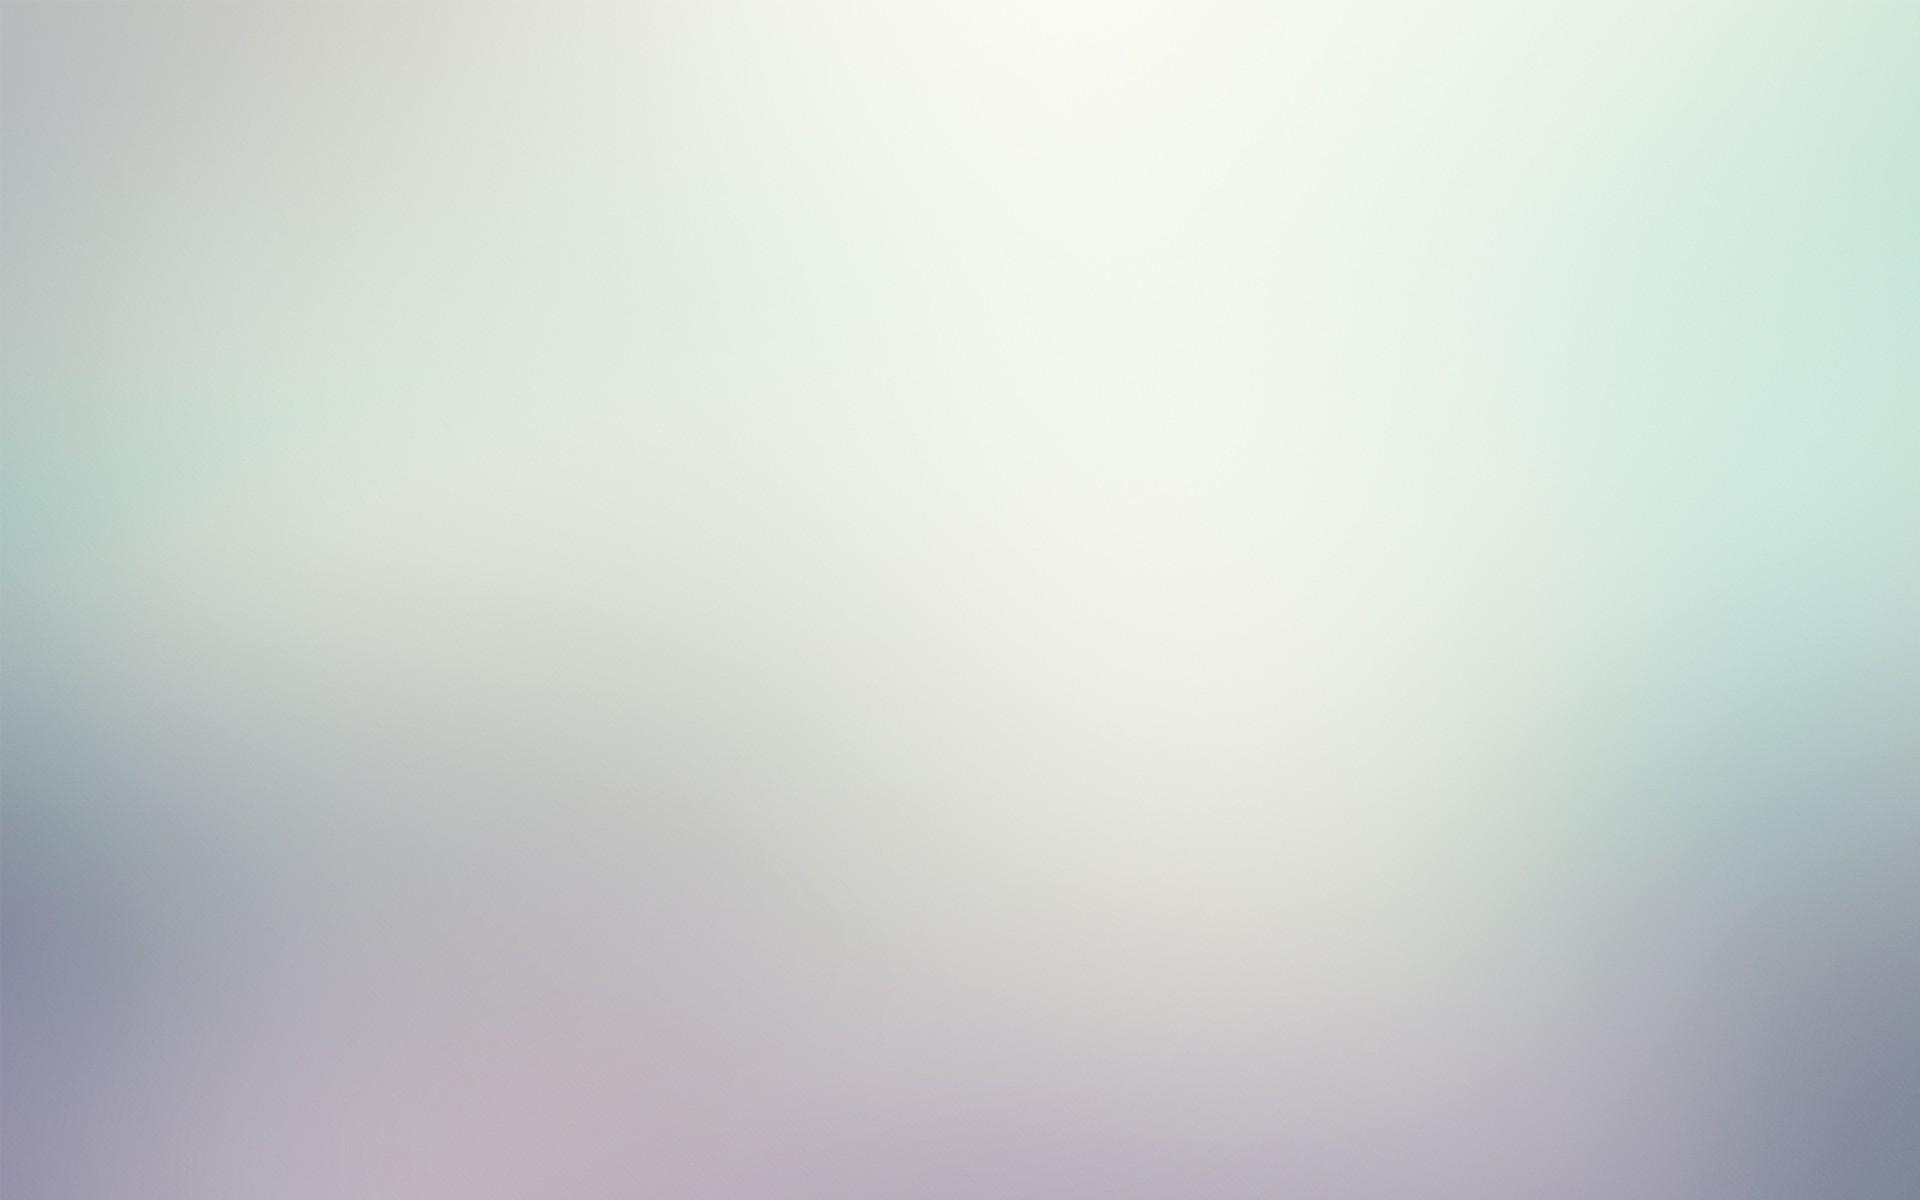 Minimal White Wallpaper